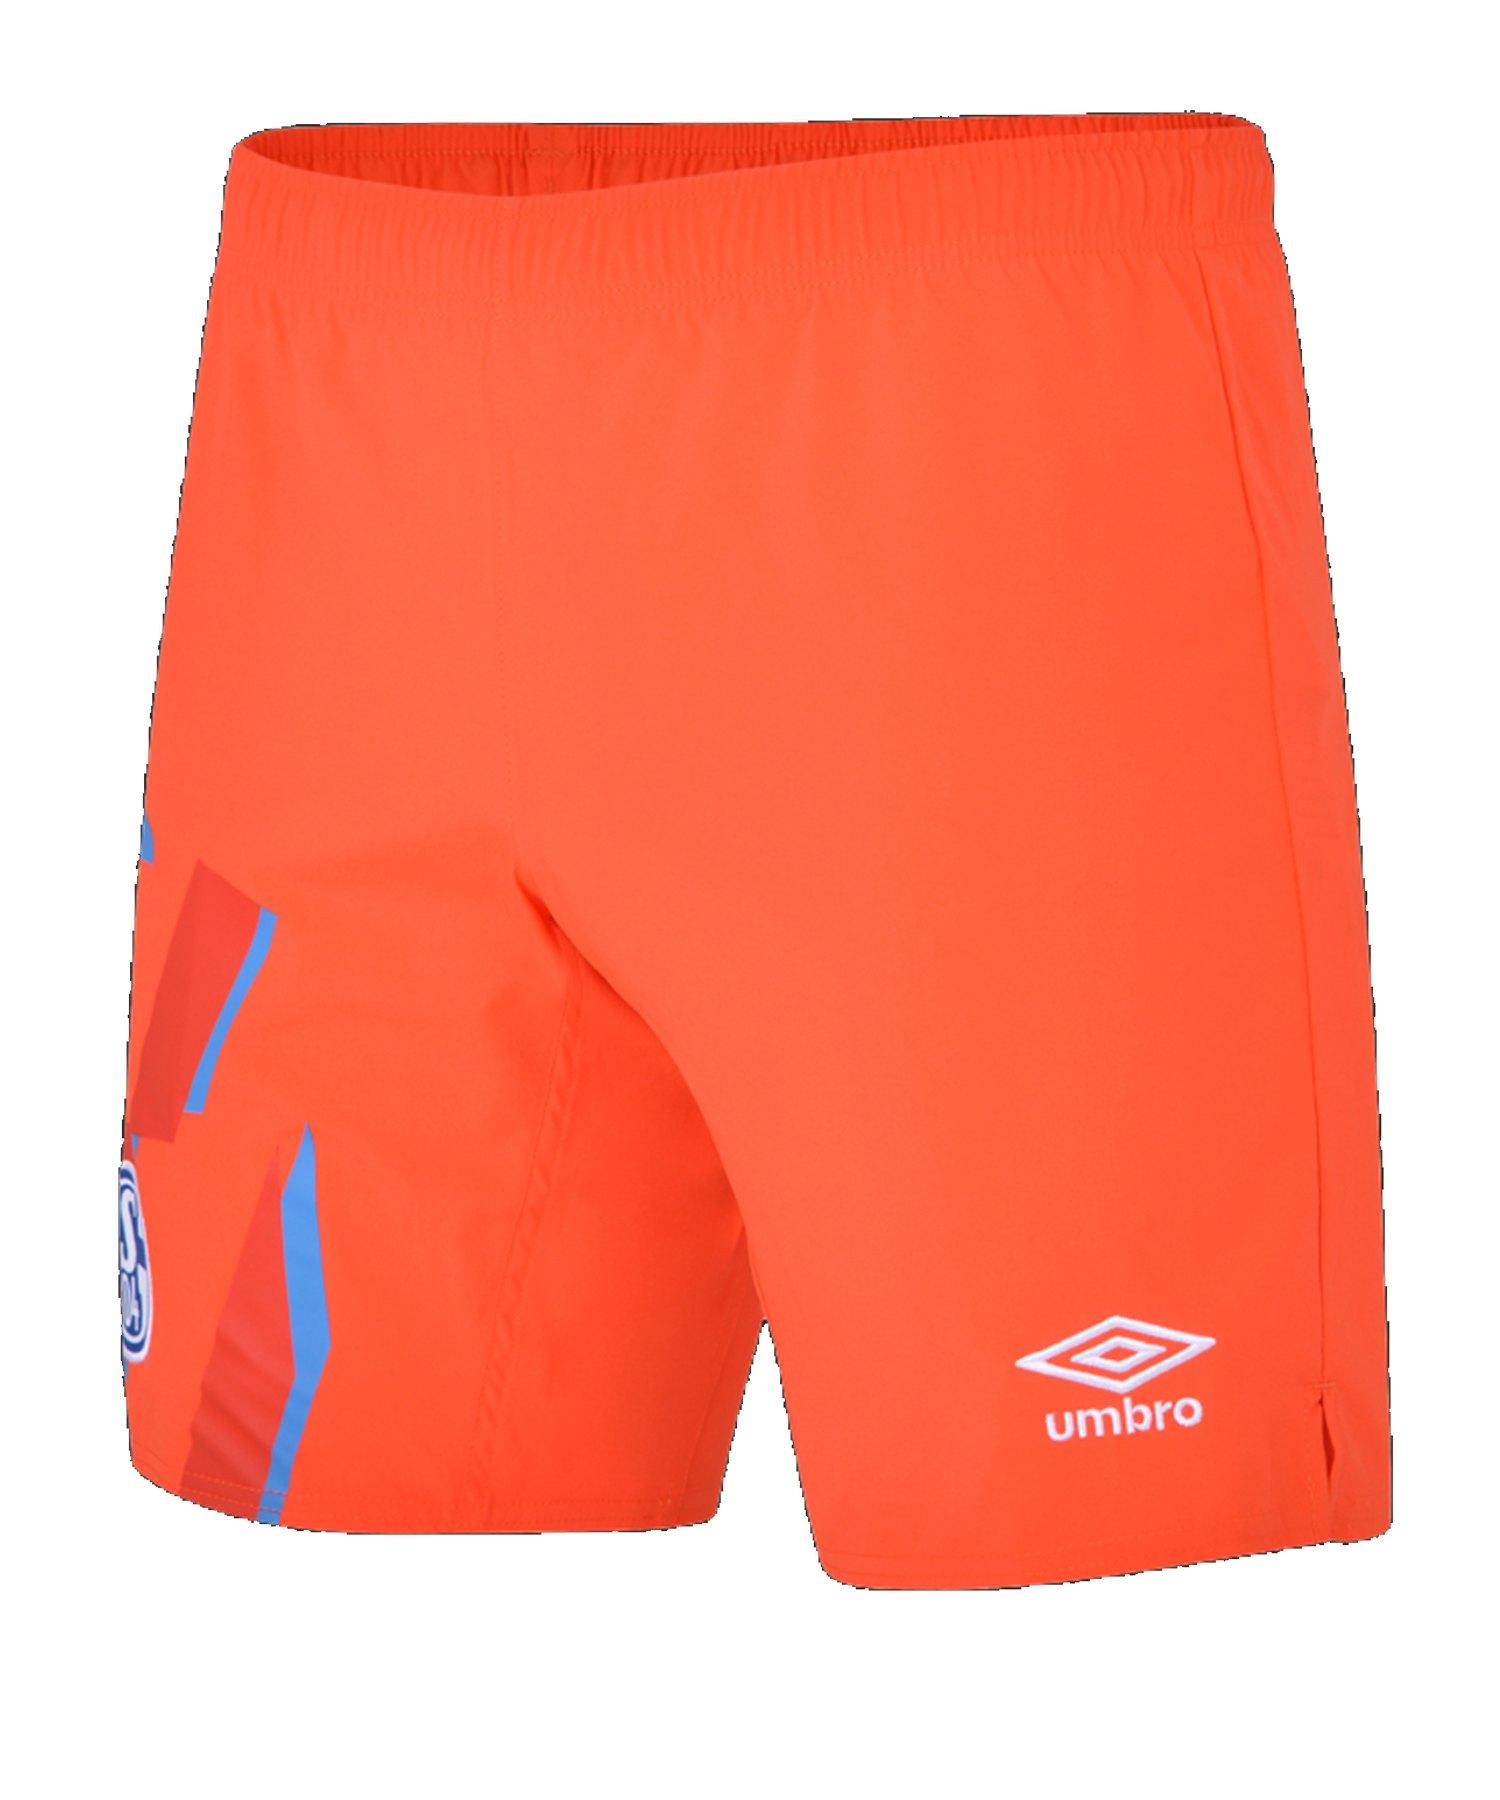 Umbro FC Schalke 04 Torwart Short Home Kids 19/20 - orange